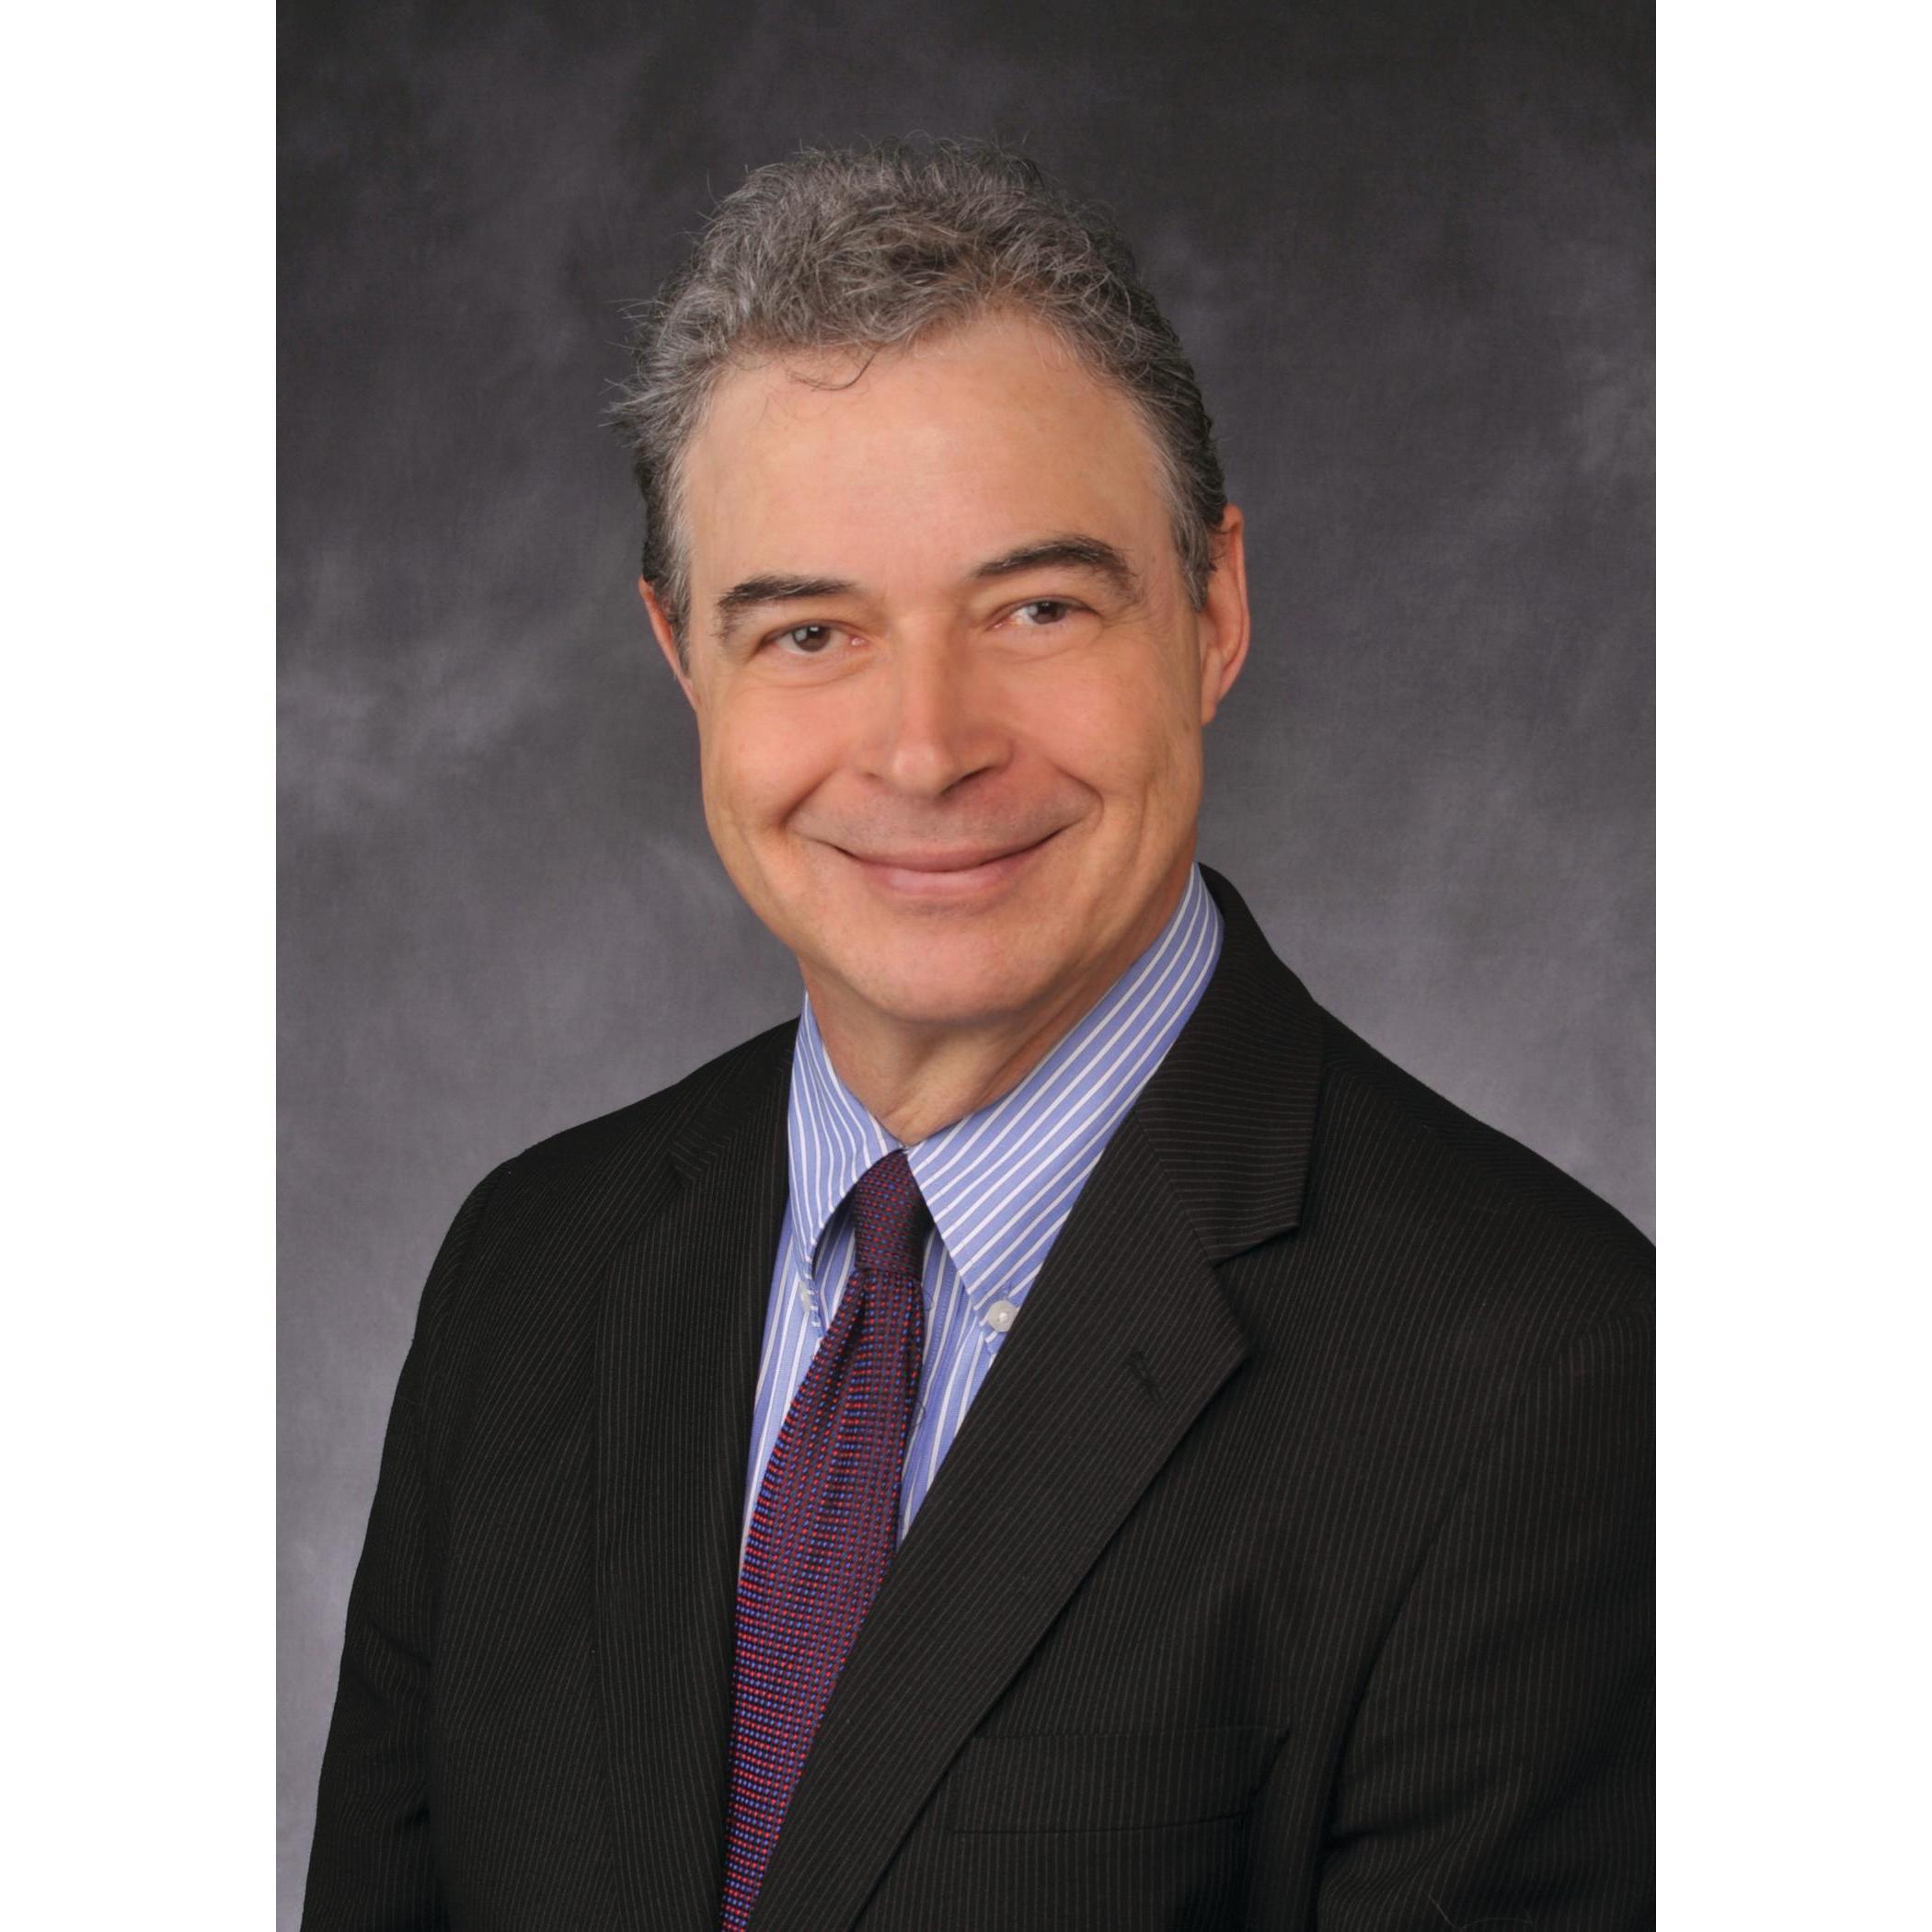 Pedro Choca - Phoenix, AZ - General or Family Practice Physicians